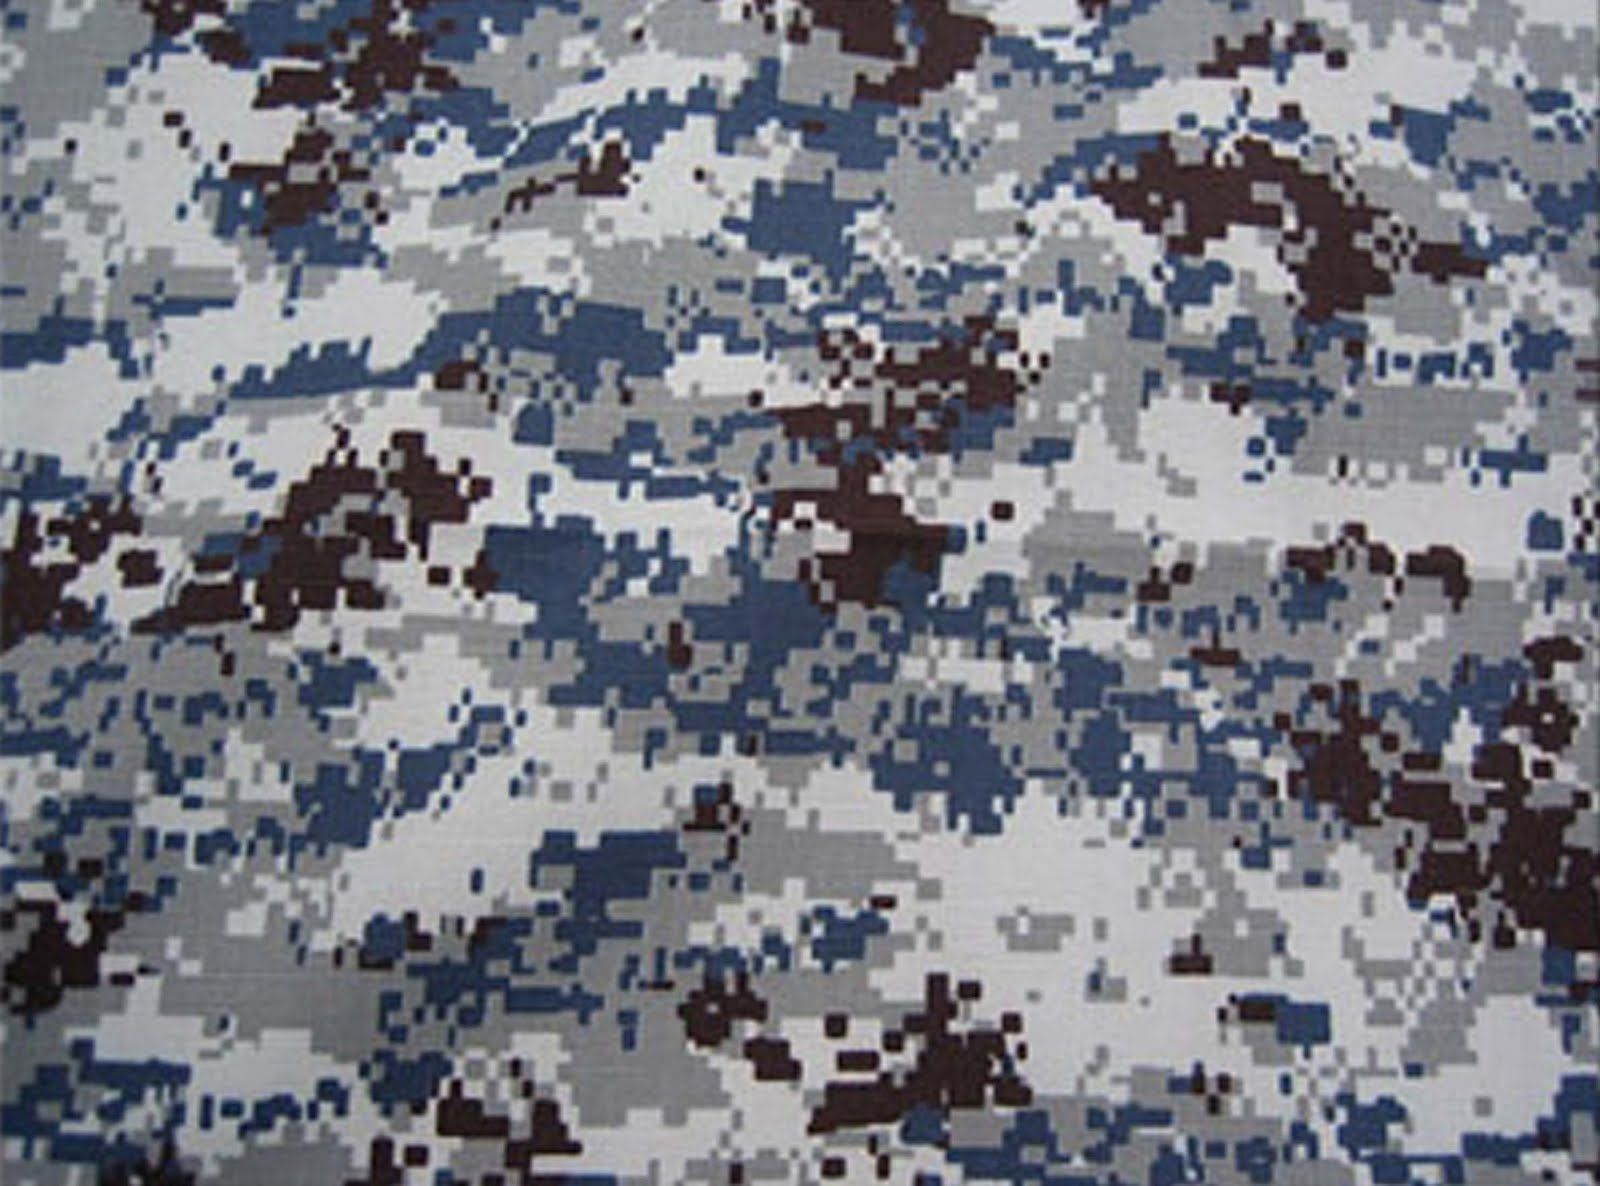 Military digital camo patterns amazon 18 inch army acu military digital camo patterns amazon 18 inch army acu digital camouflage pattern amipublicfo Choice Image